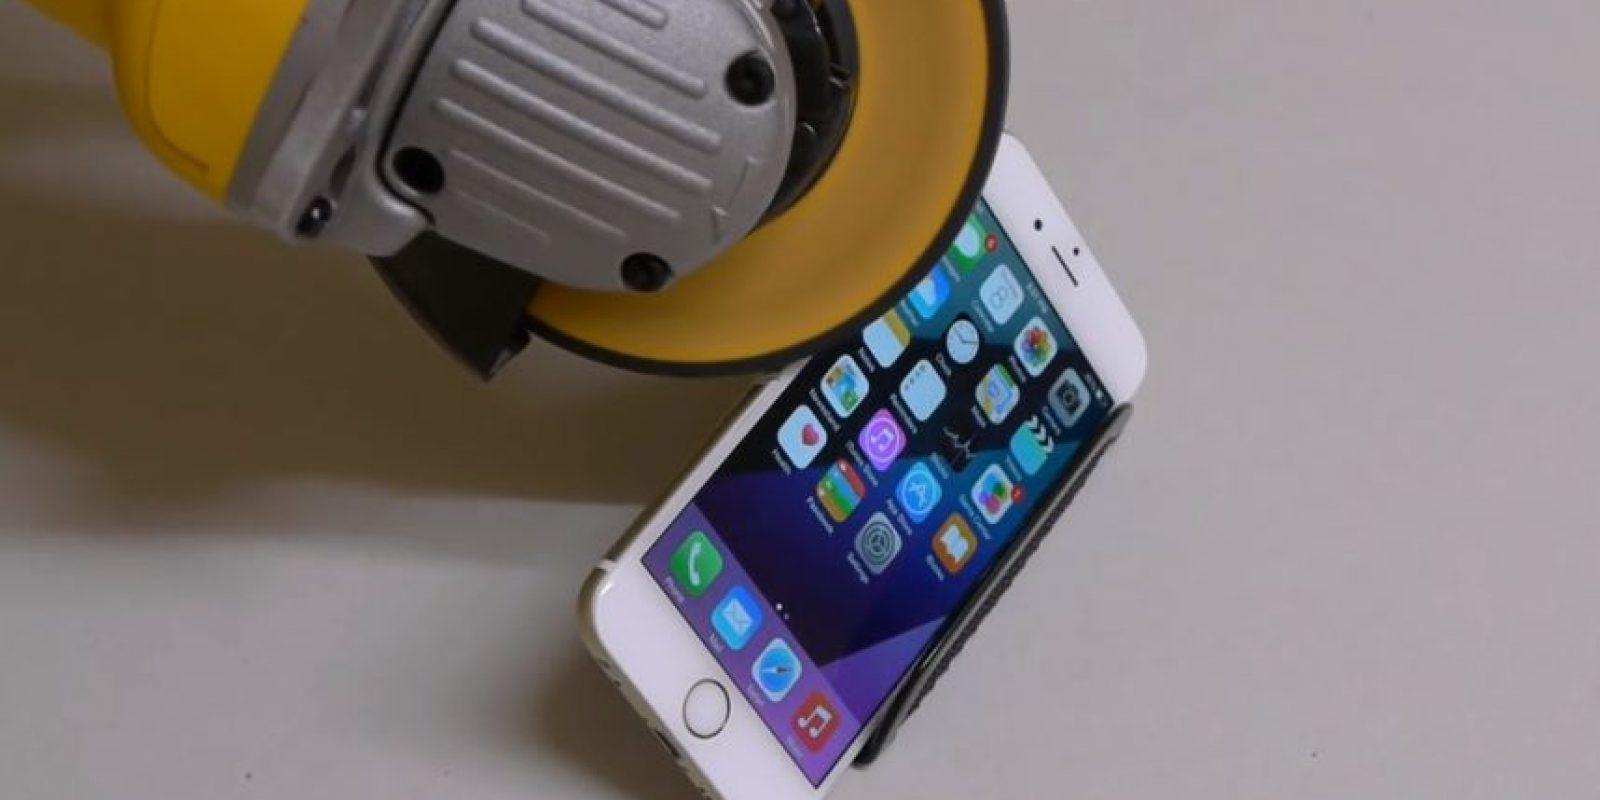 iPhone 6 contra una sierra eléctrica. Foto:TechRax